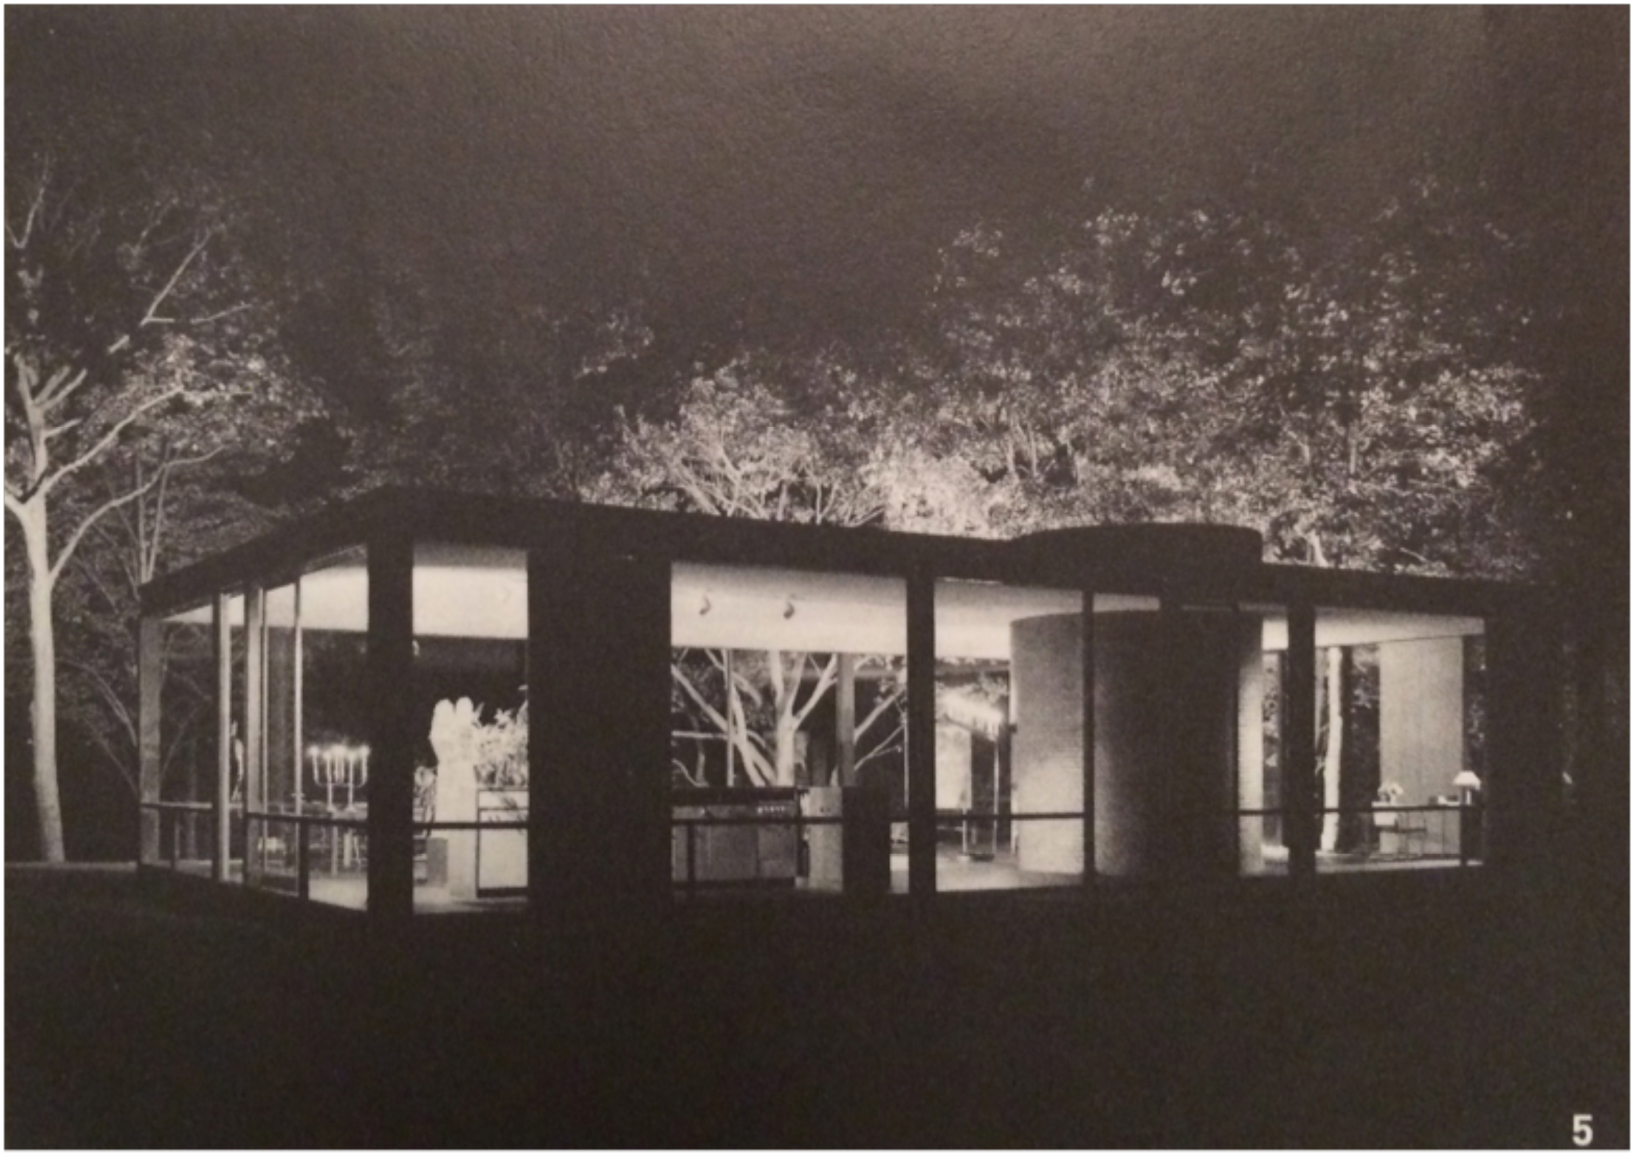 Richard Kelly lighting Philip Johnson's Glass House